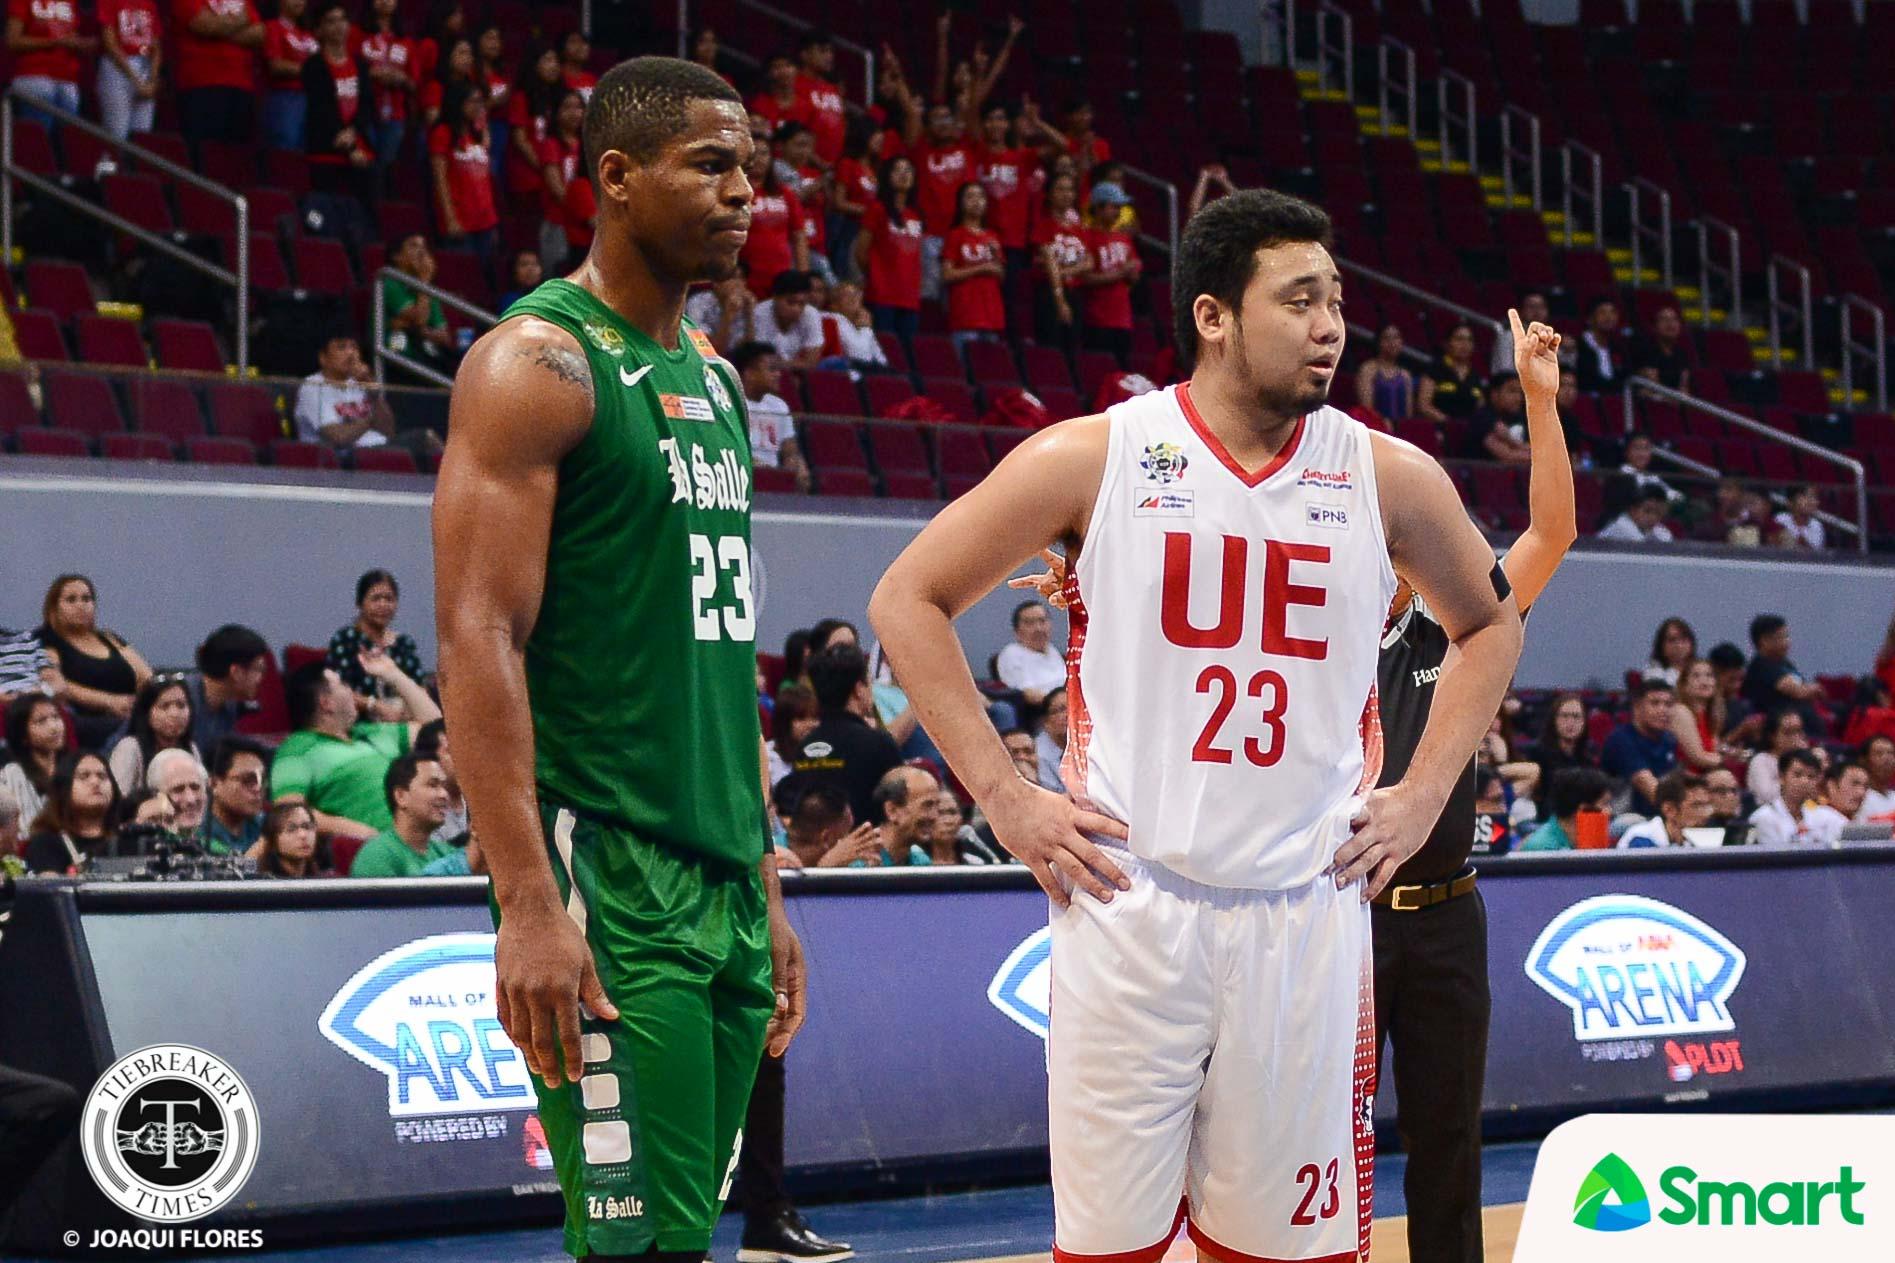 Philippine Sports News - Tiebreaker Times Alvin Pasaol holds head up high after surviving Ben Mbala Basketball News UAAP UE  UE Men's Basketball UAAP Season 80 Men's Basketball UAAP Season 80 Alvin Pasaol